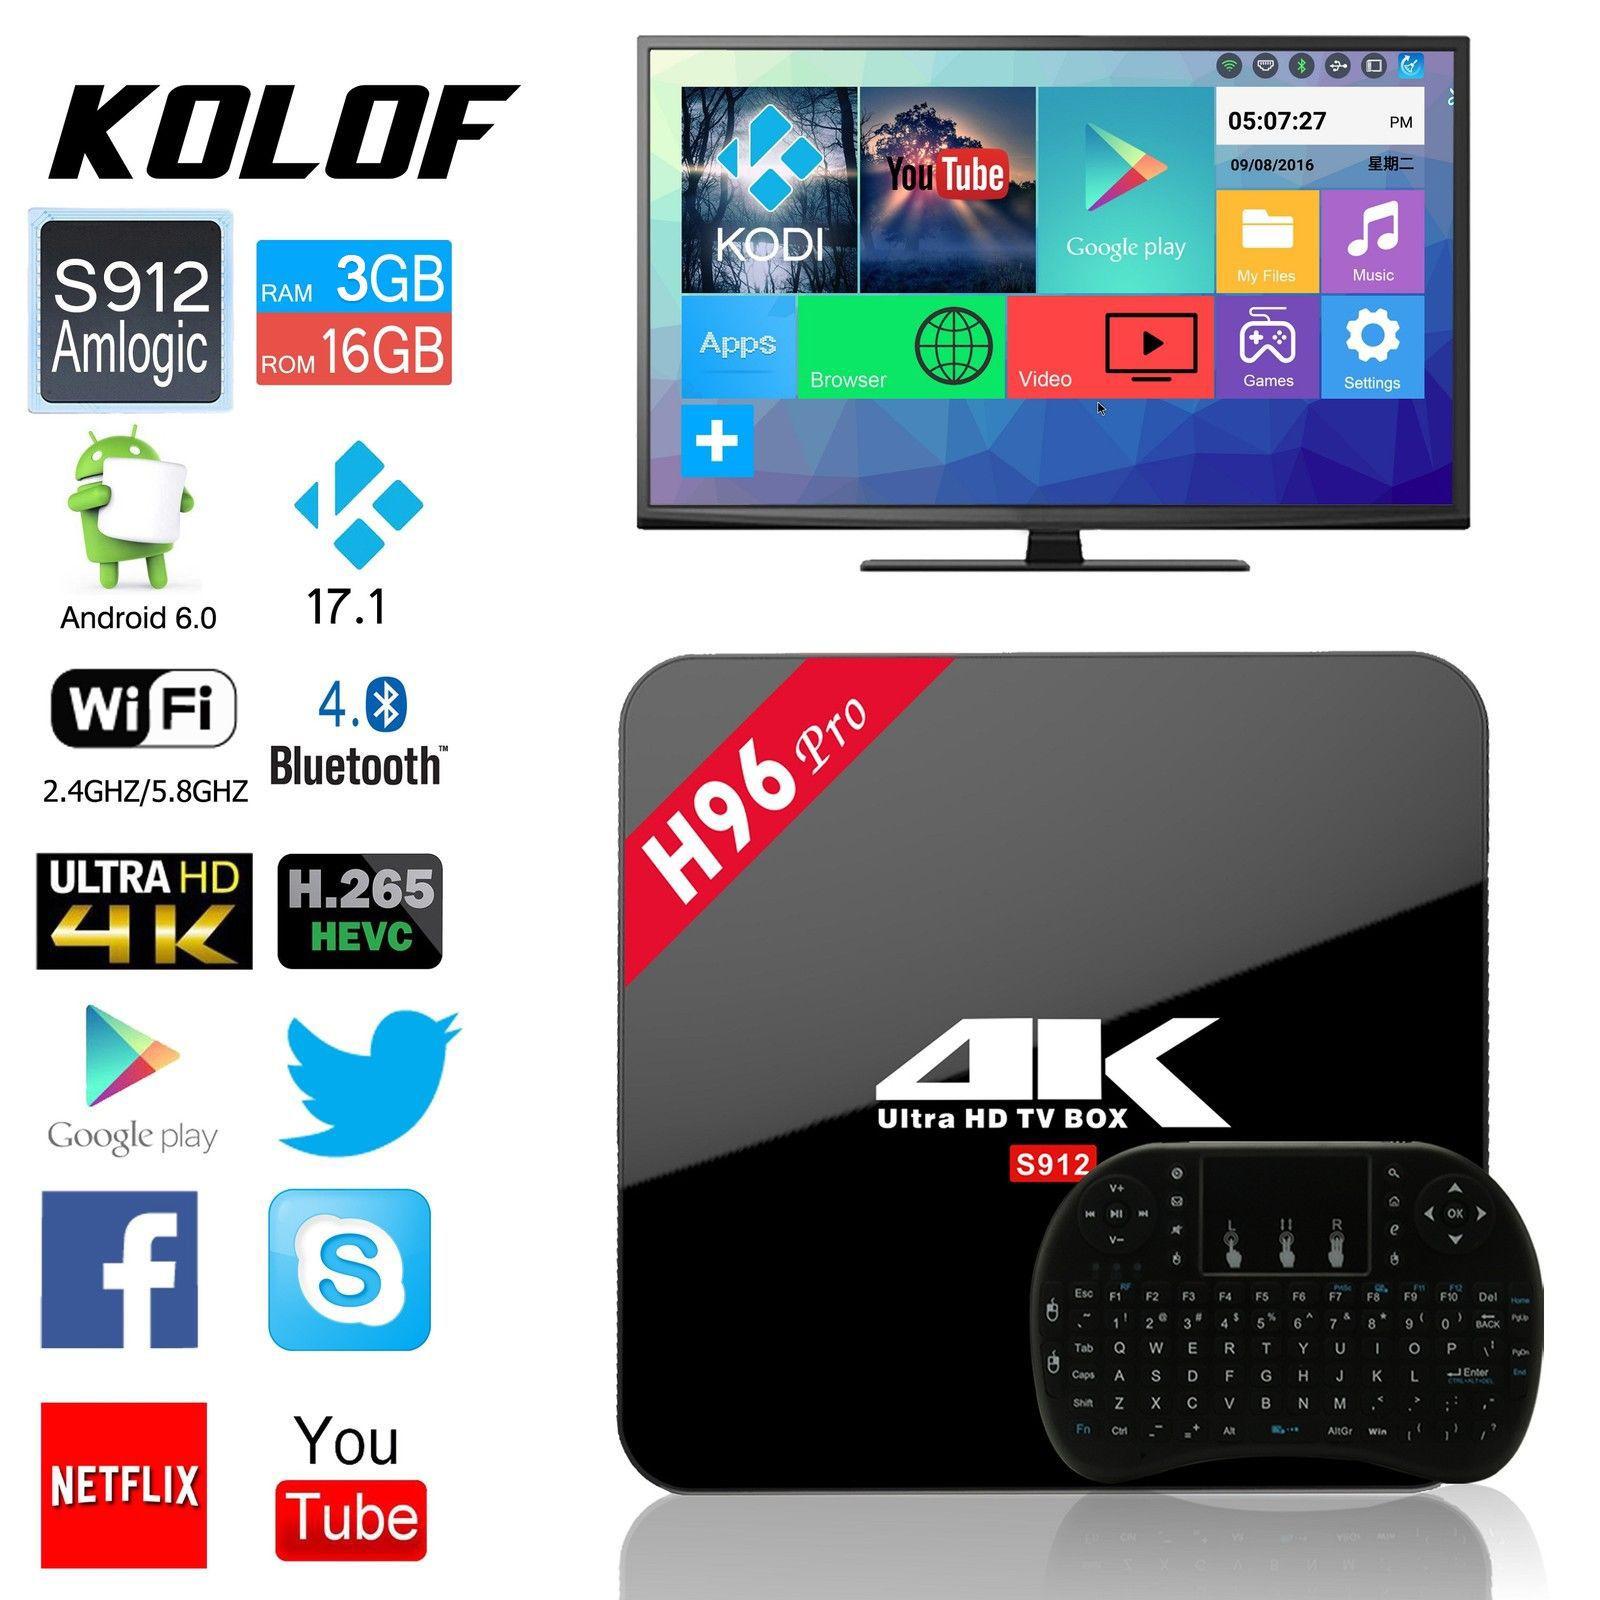 H96 PRO Android 6.0 S912 3G/16G KODI 16.1 TV BOX WIFI BT4 Media Player +Keyboard  http://searchpromocodes.club/h96-pro-android-6-0-s912-3g16g-kodi-16-1-tv-box-wifi-bt4-media-player-keyboard-3/